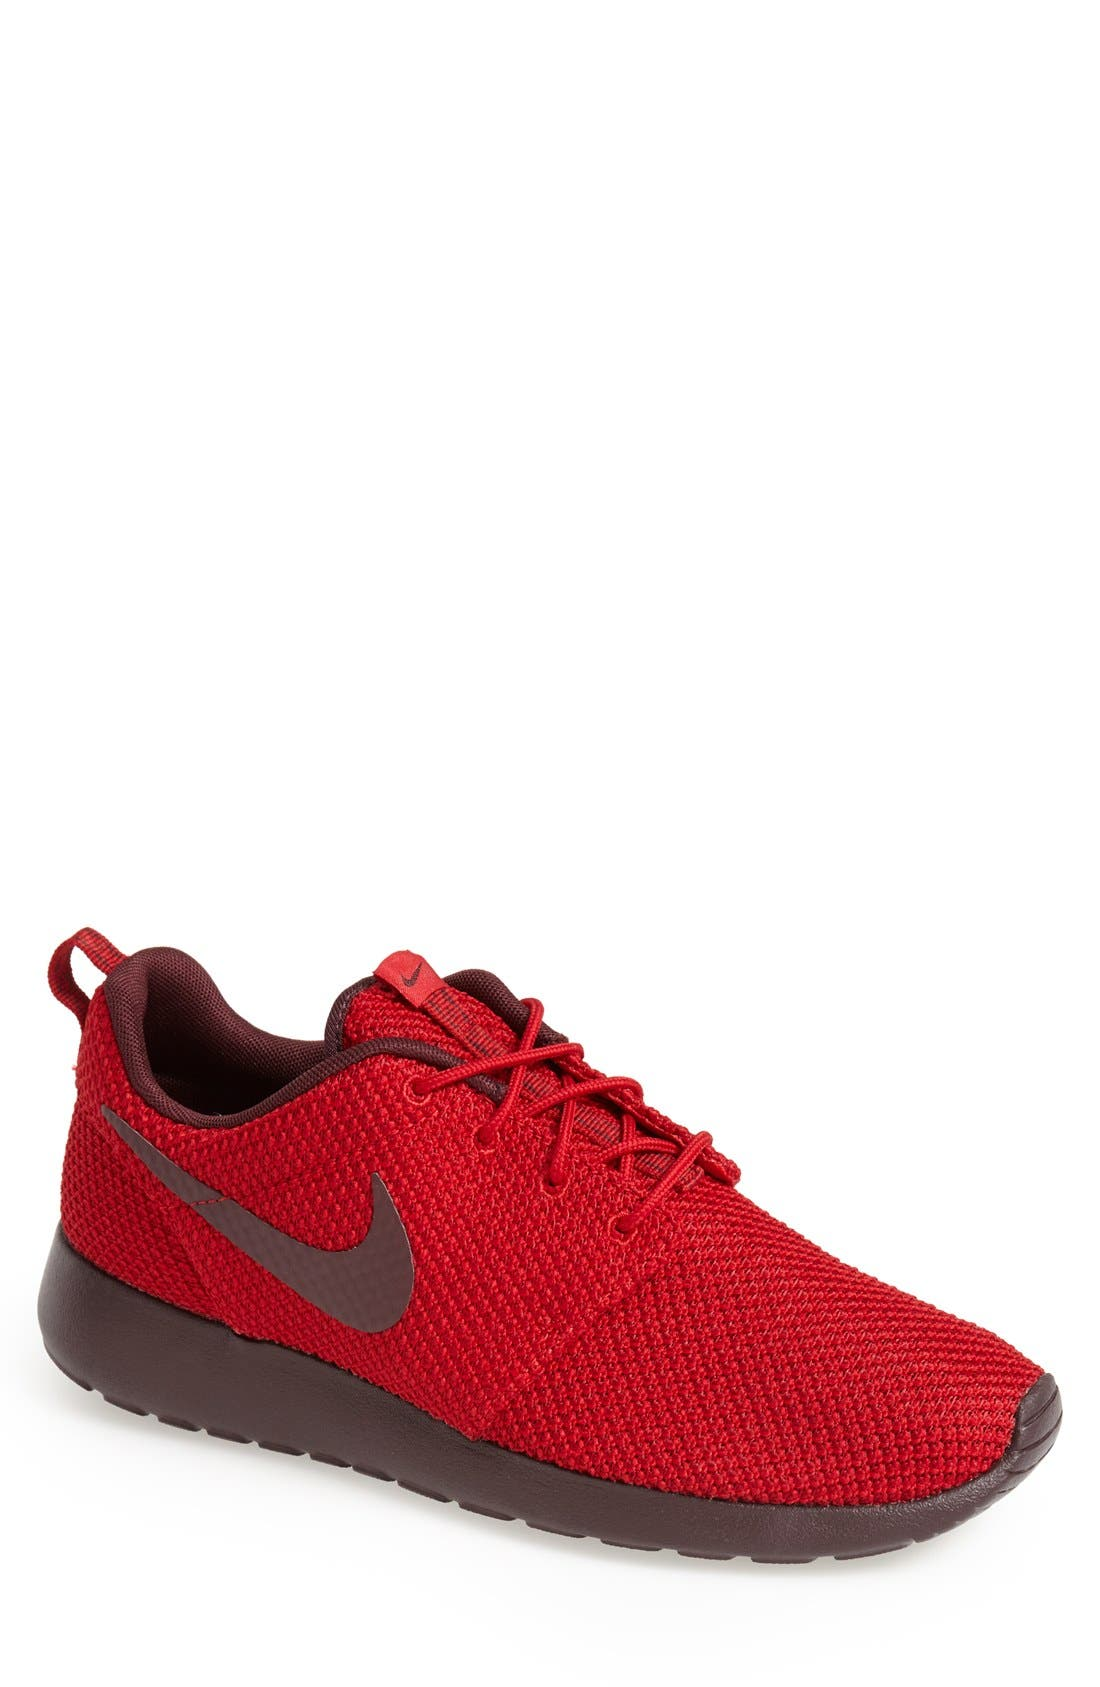 ,                             'Roshe Run' Sneaker,                             Main thumbnail 127, color,                             606